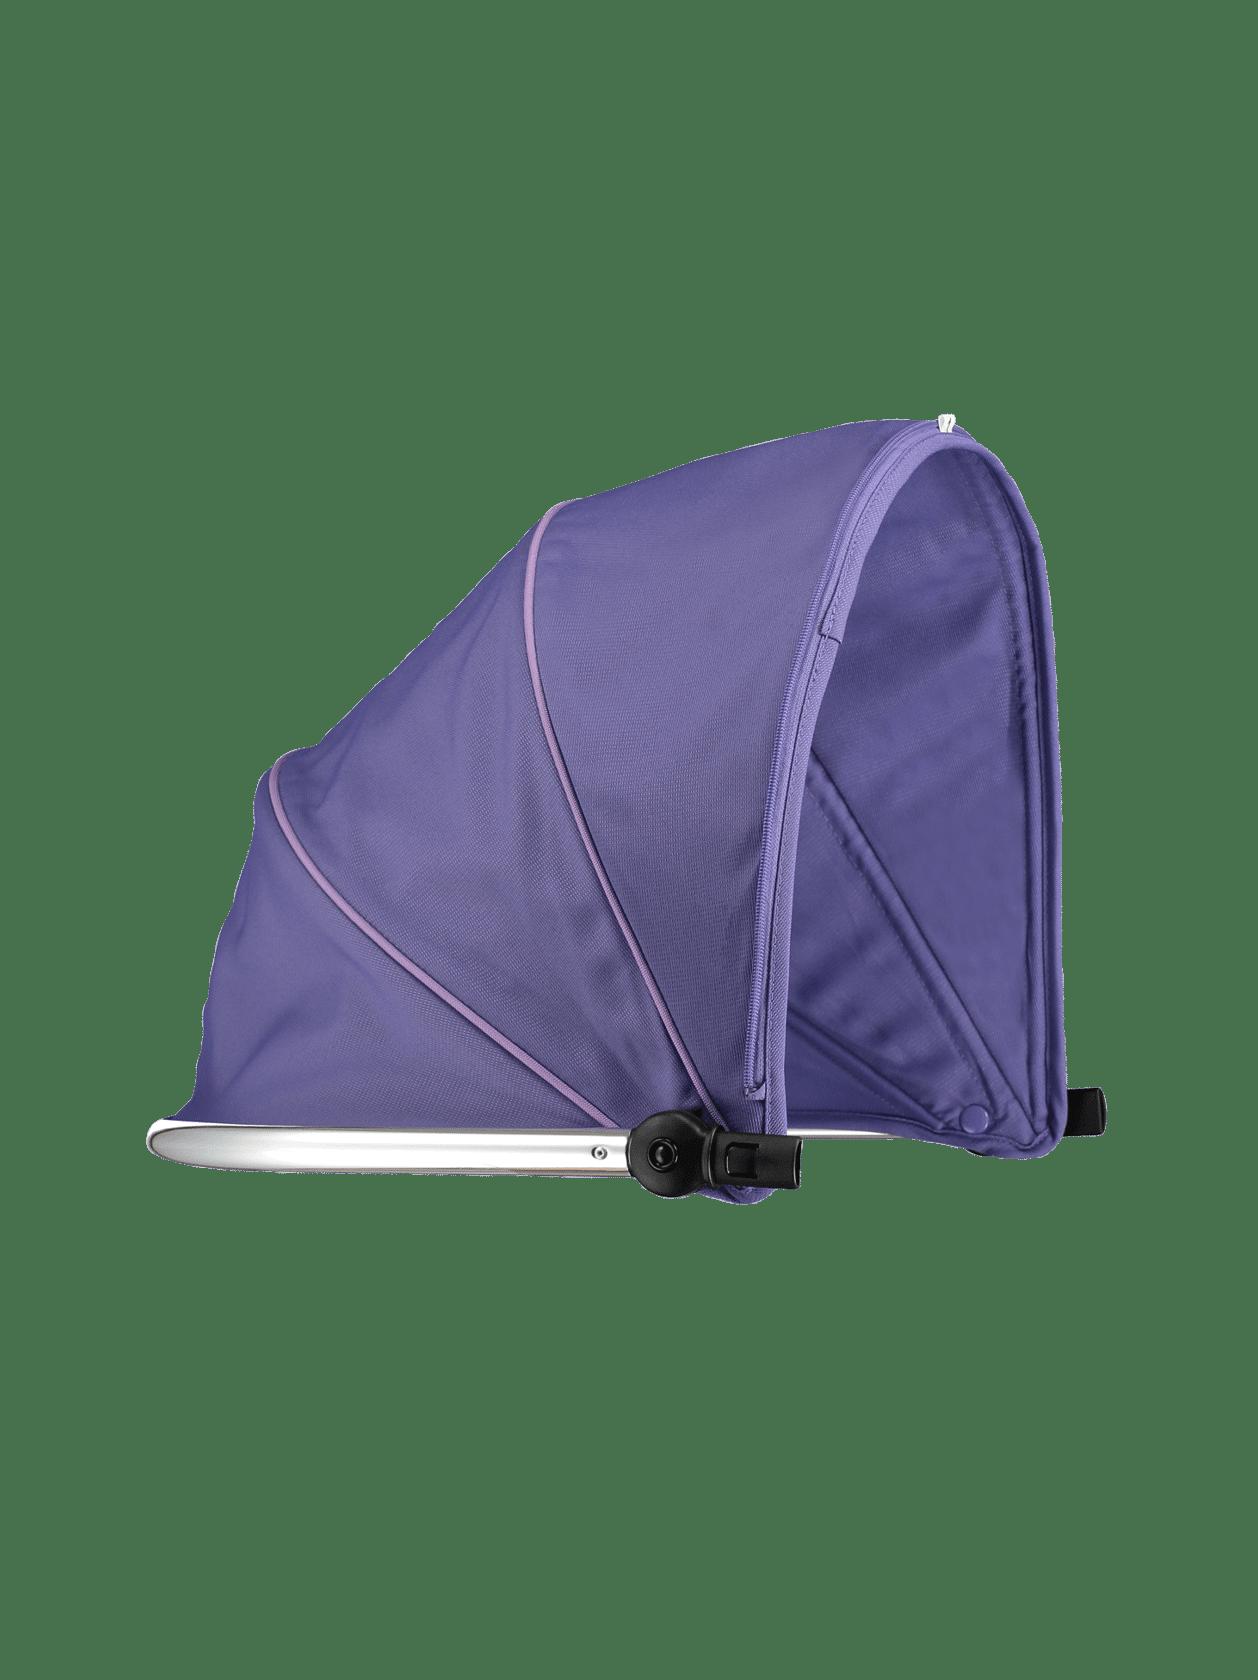 Peach Main Seat Hood - Parma Violet